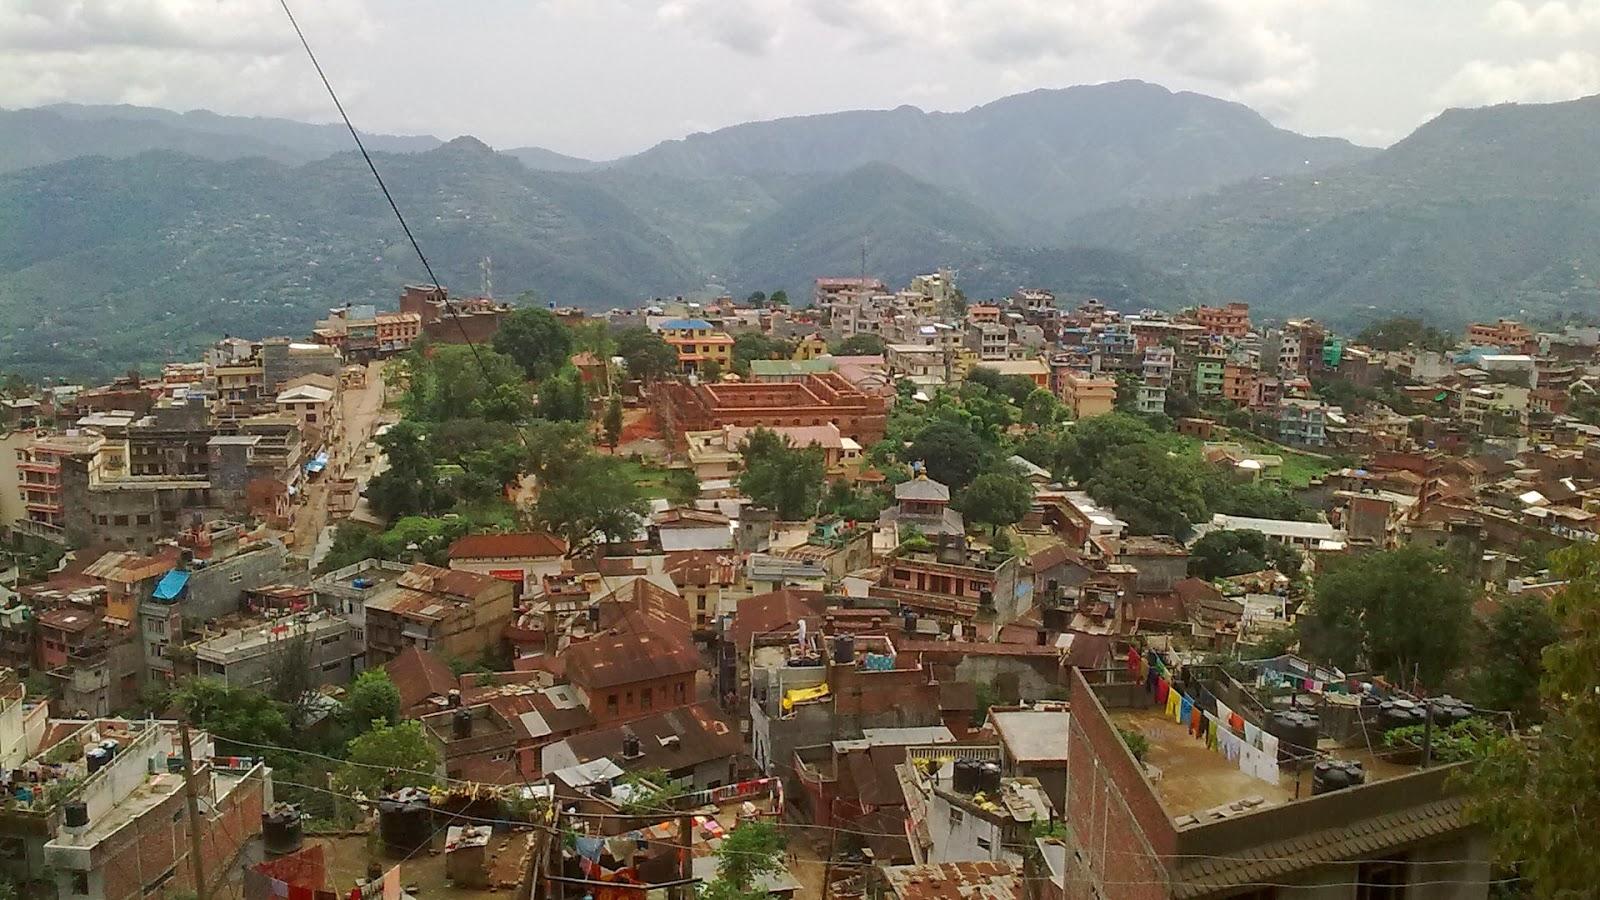 Palpa Nepal  city images : ... village tour in palpa, historical tour to palpa, palpa heritage tour